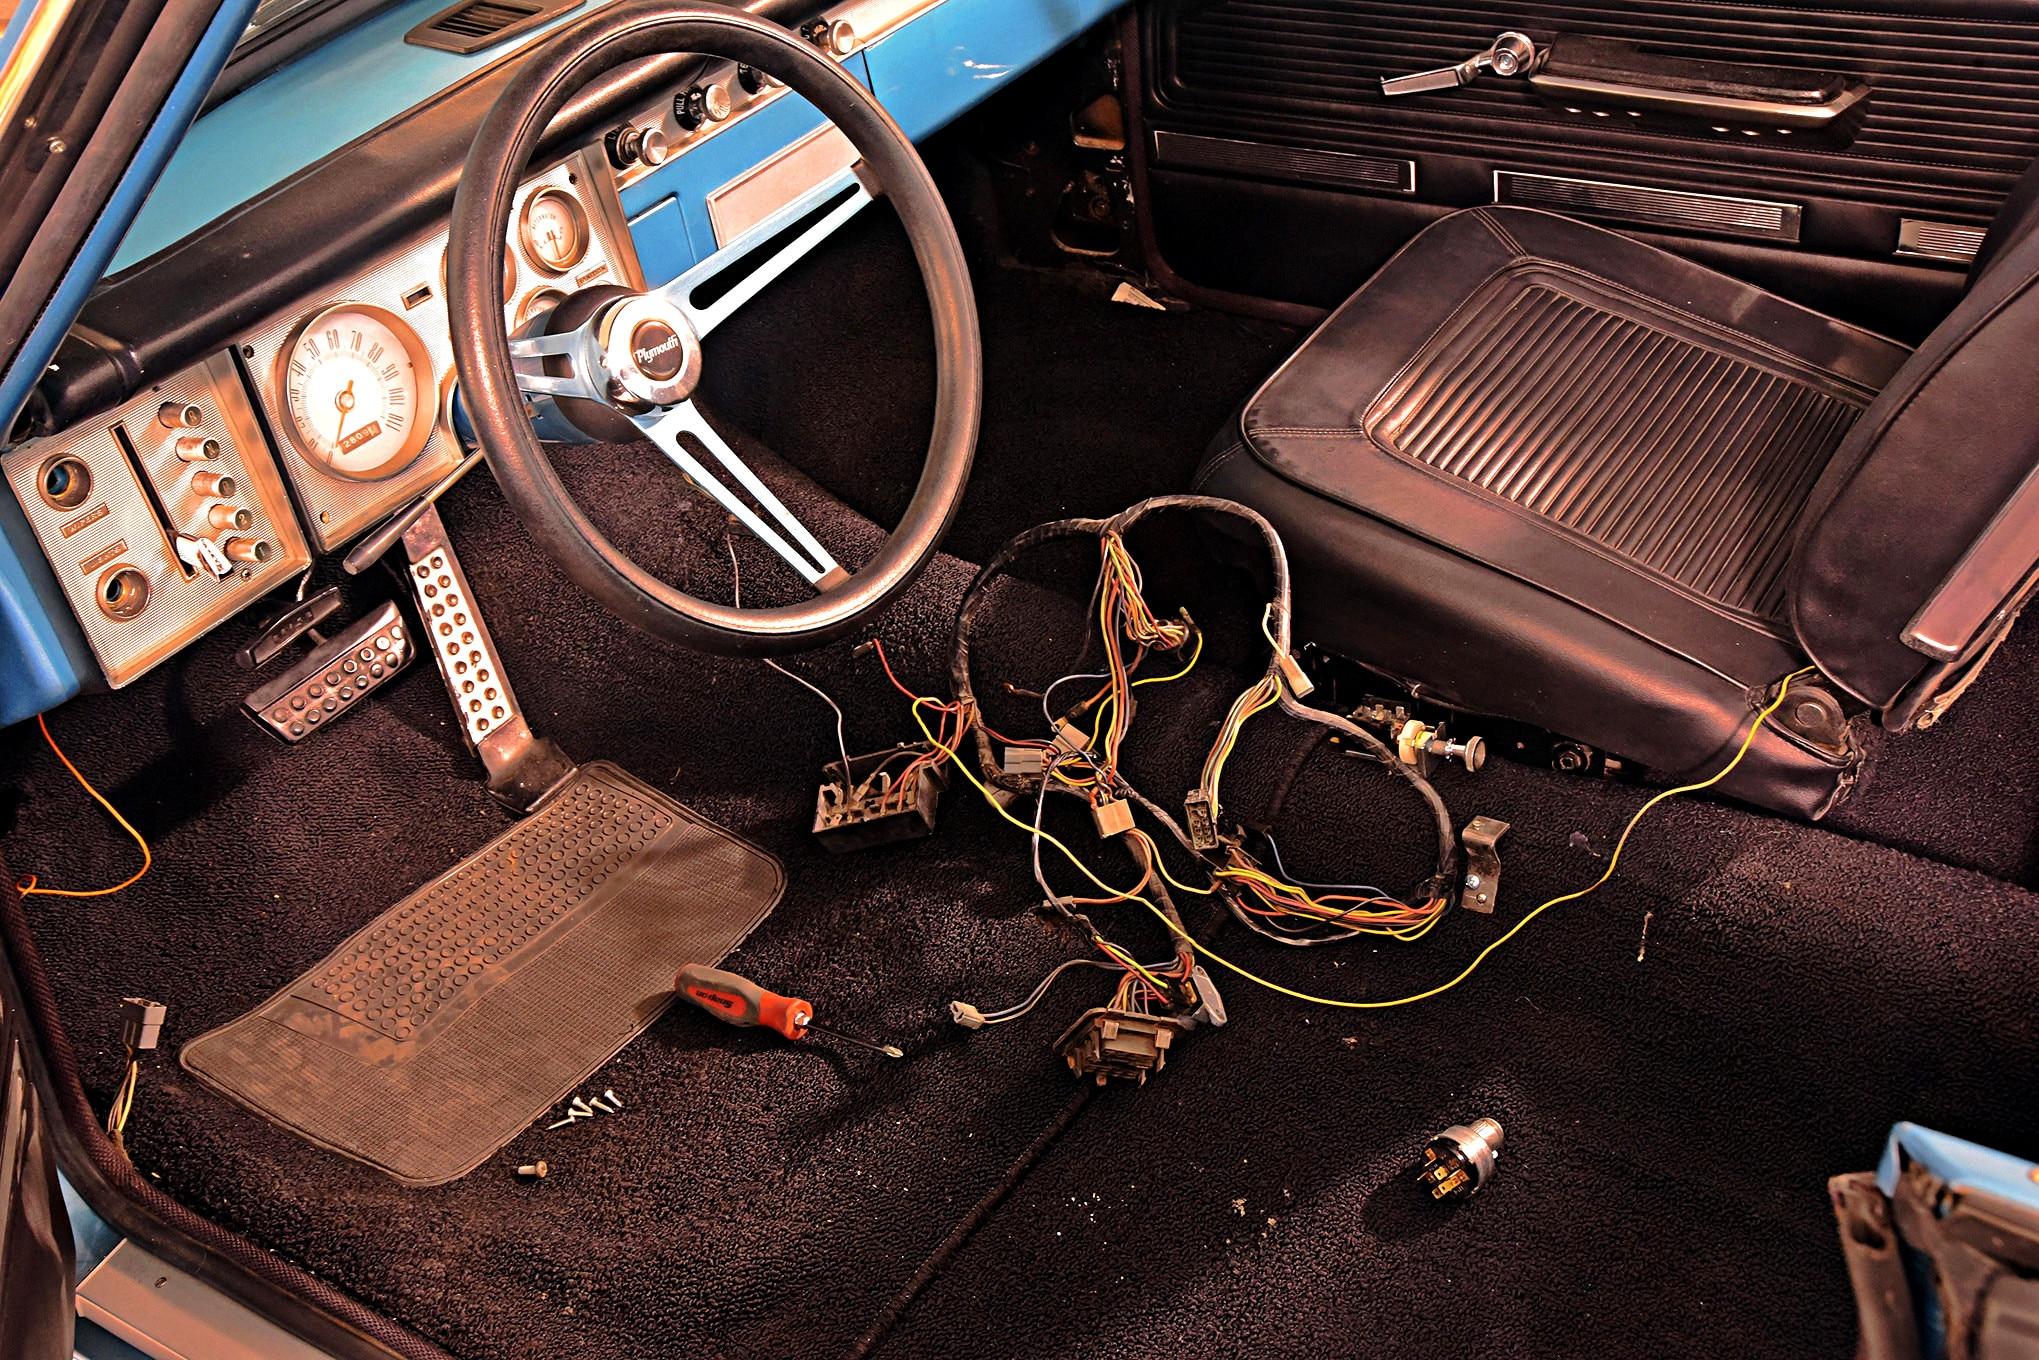 medium resolution of 1965 barracuda wiring harness electrical wiring diagrams 65 plymouth barracuda 4 sale 1965 plymouth barracuda wiring